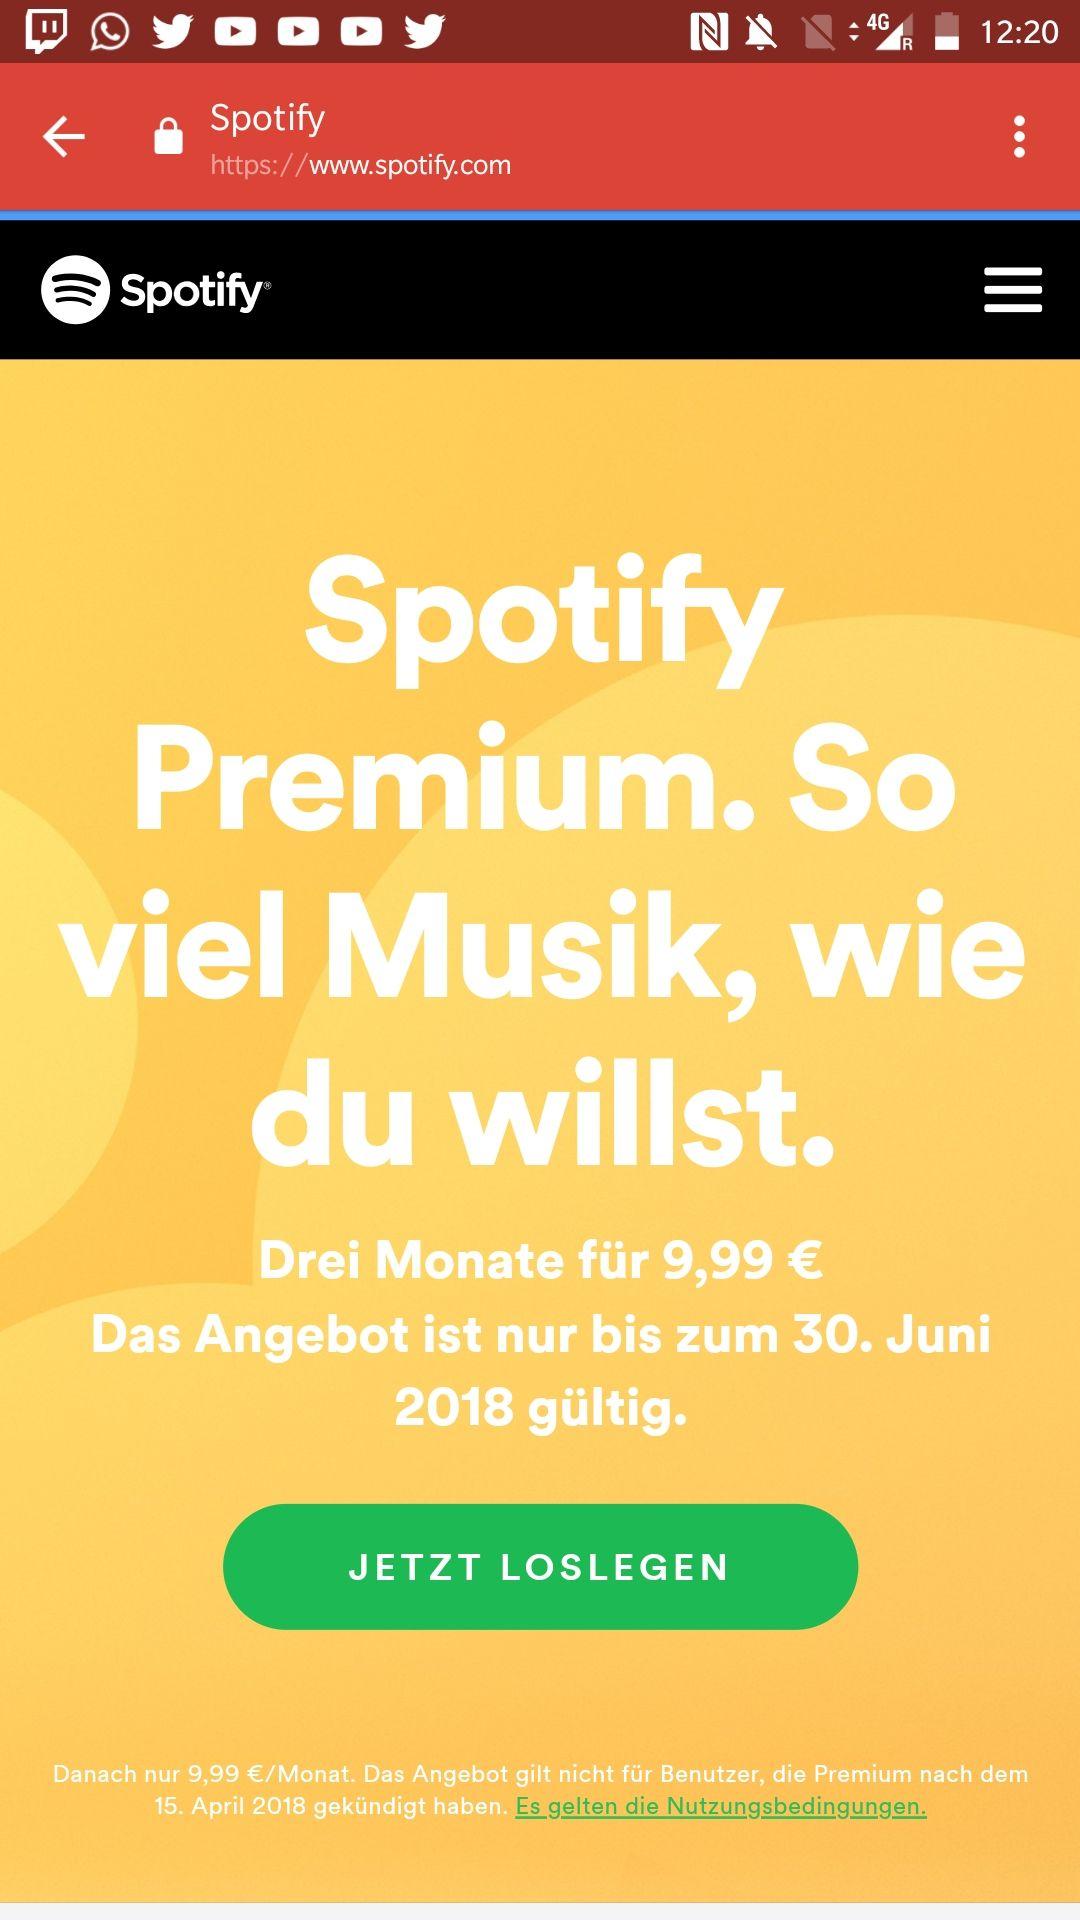 Spotify Premium 3 Monate für 9,99